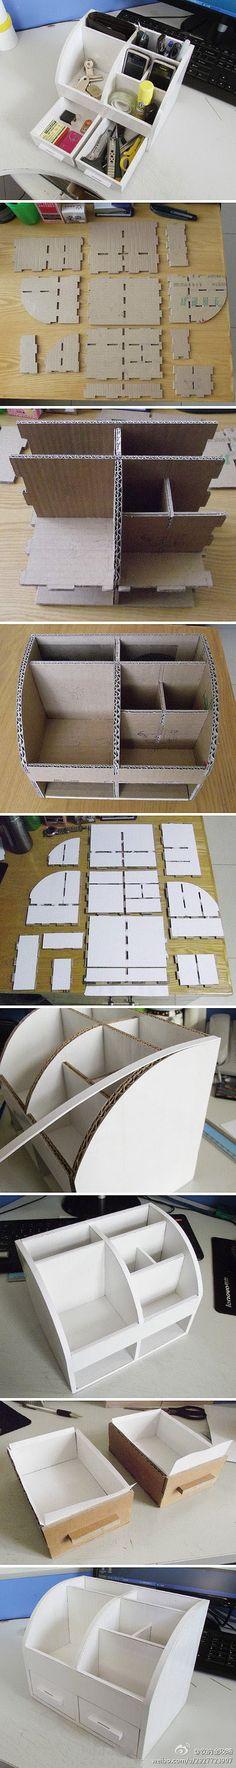 Storage Box with Drawer | Materials: Corrugated Cardboard | Instructions: http://tieba.baidu.com/p/2927723907